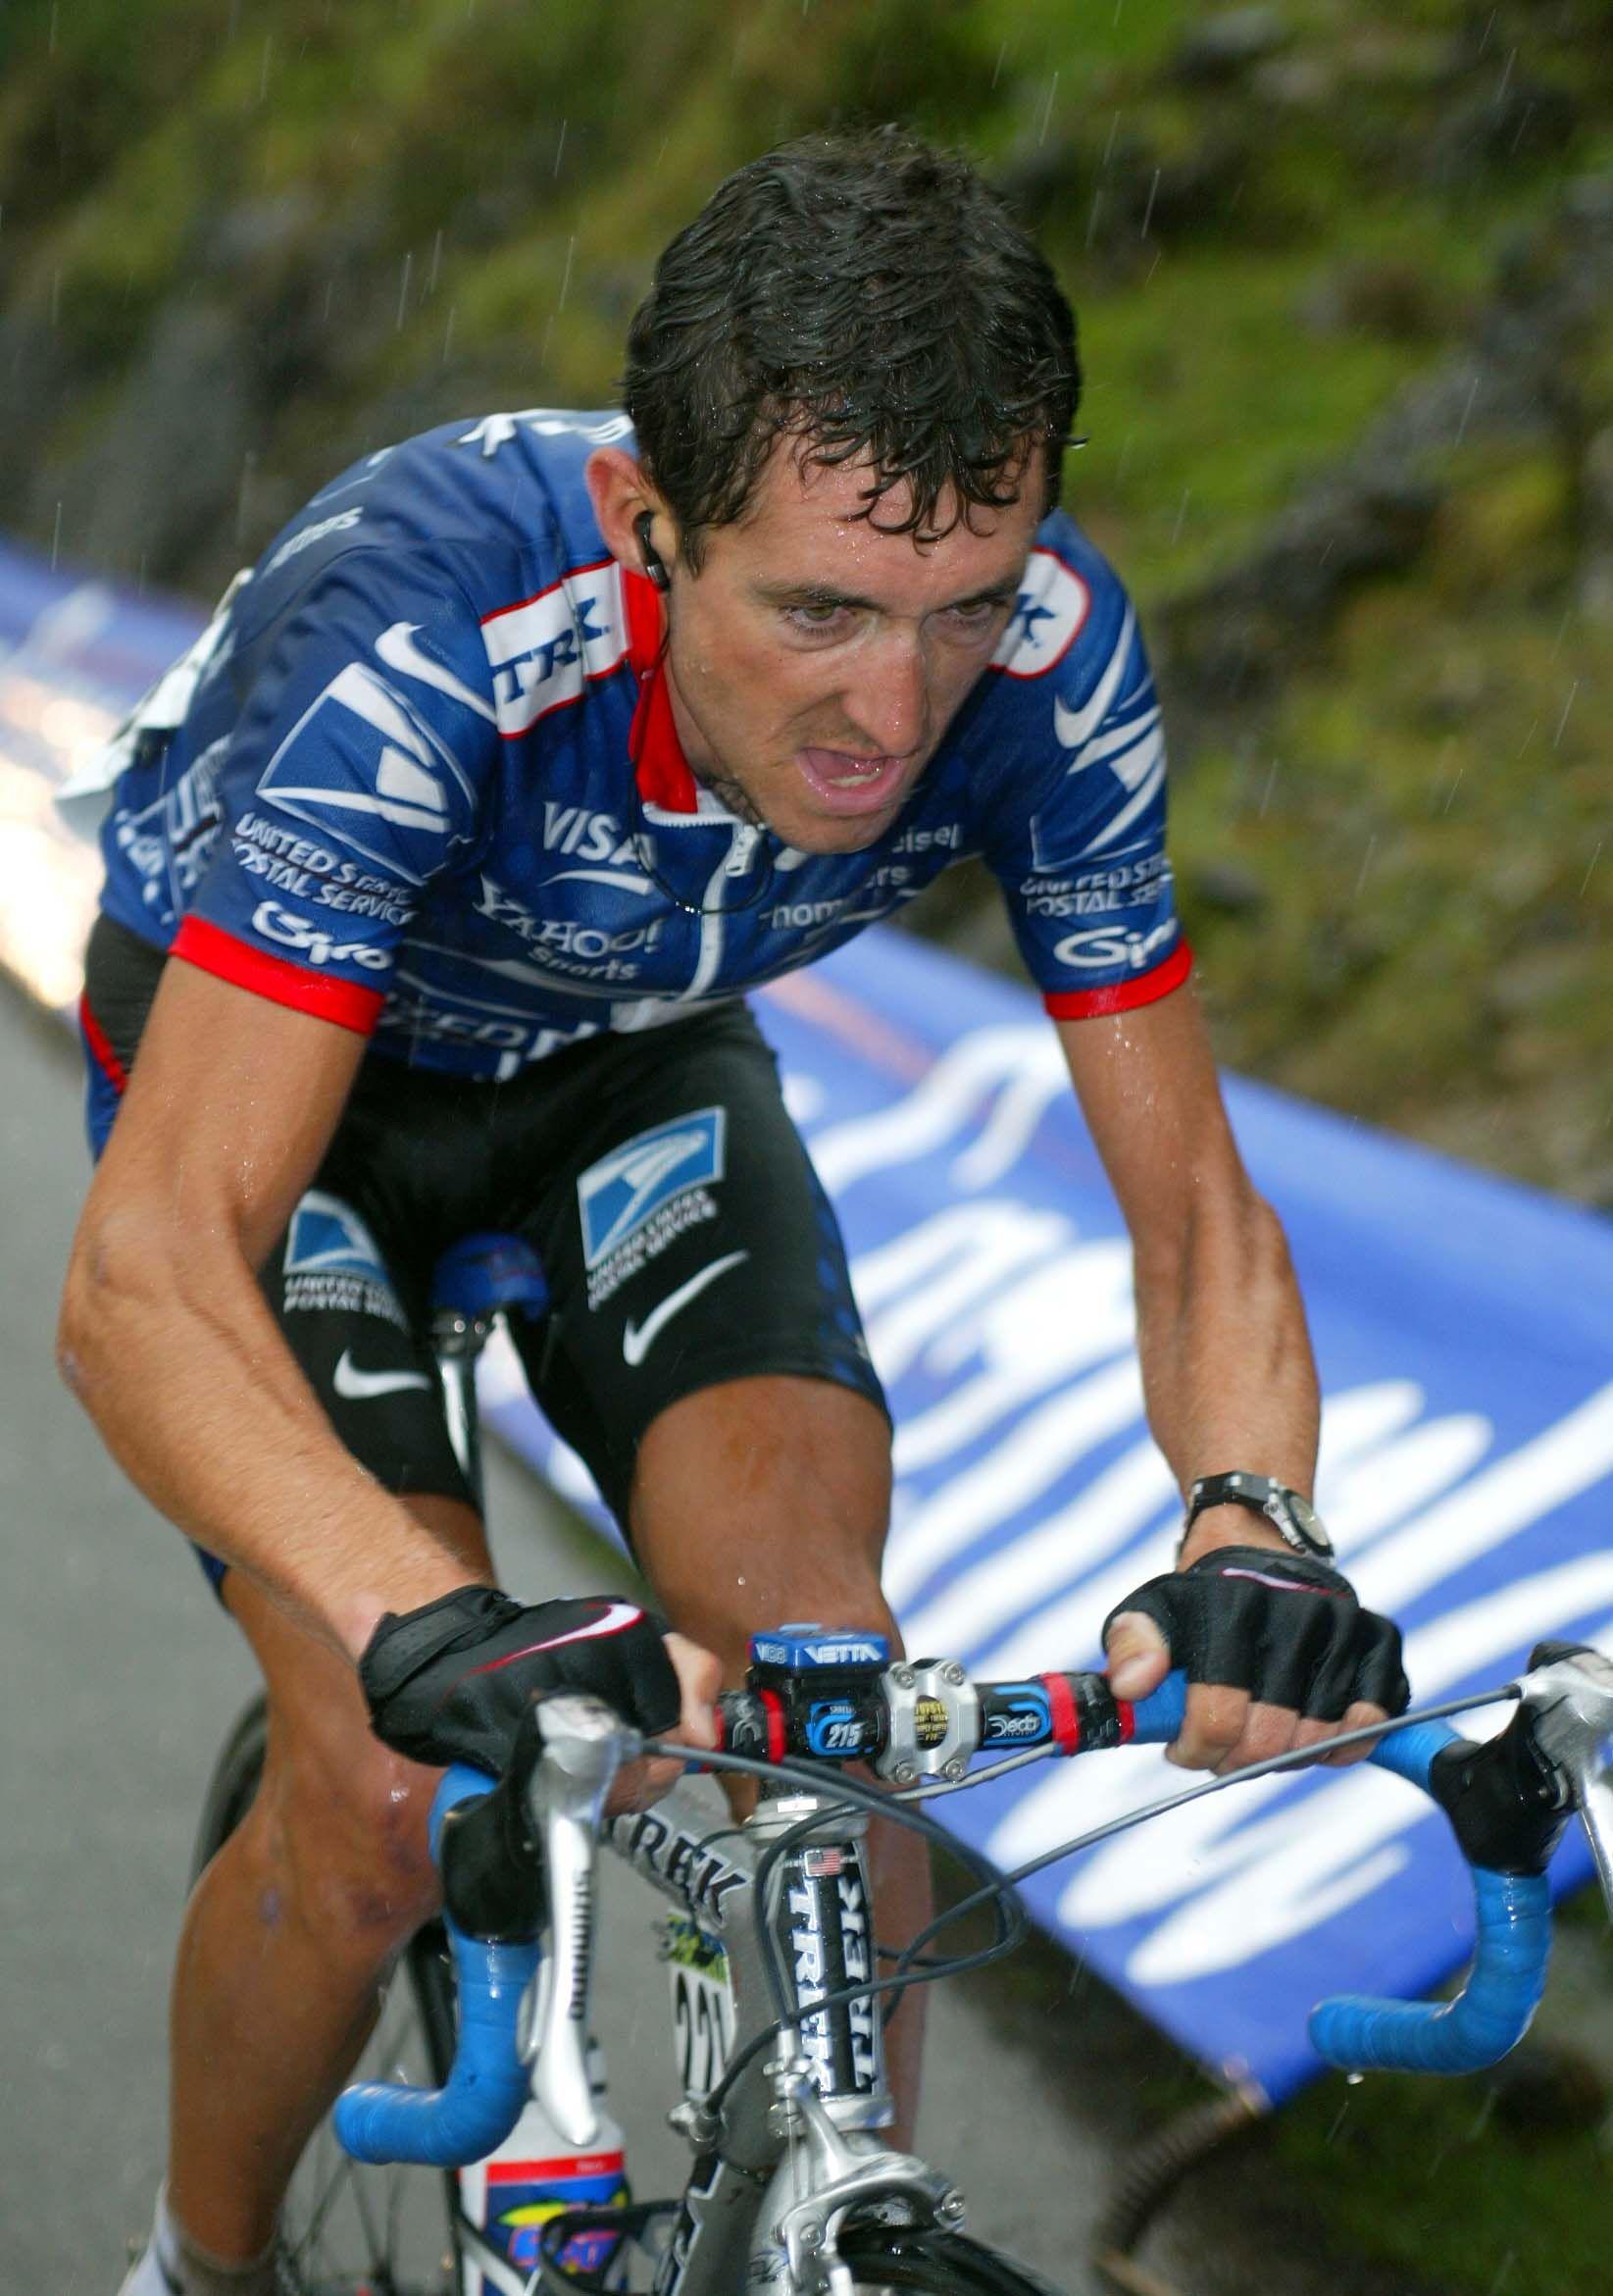 Roberto Heras. Cycling news, Road bike cycling, Sports cycle